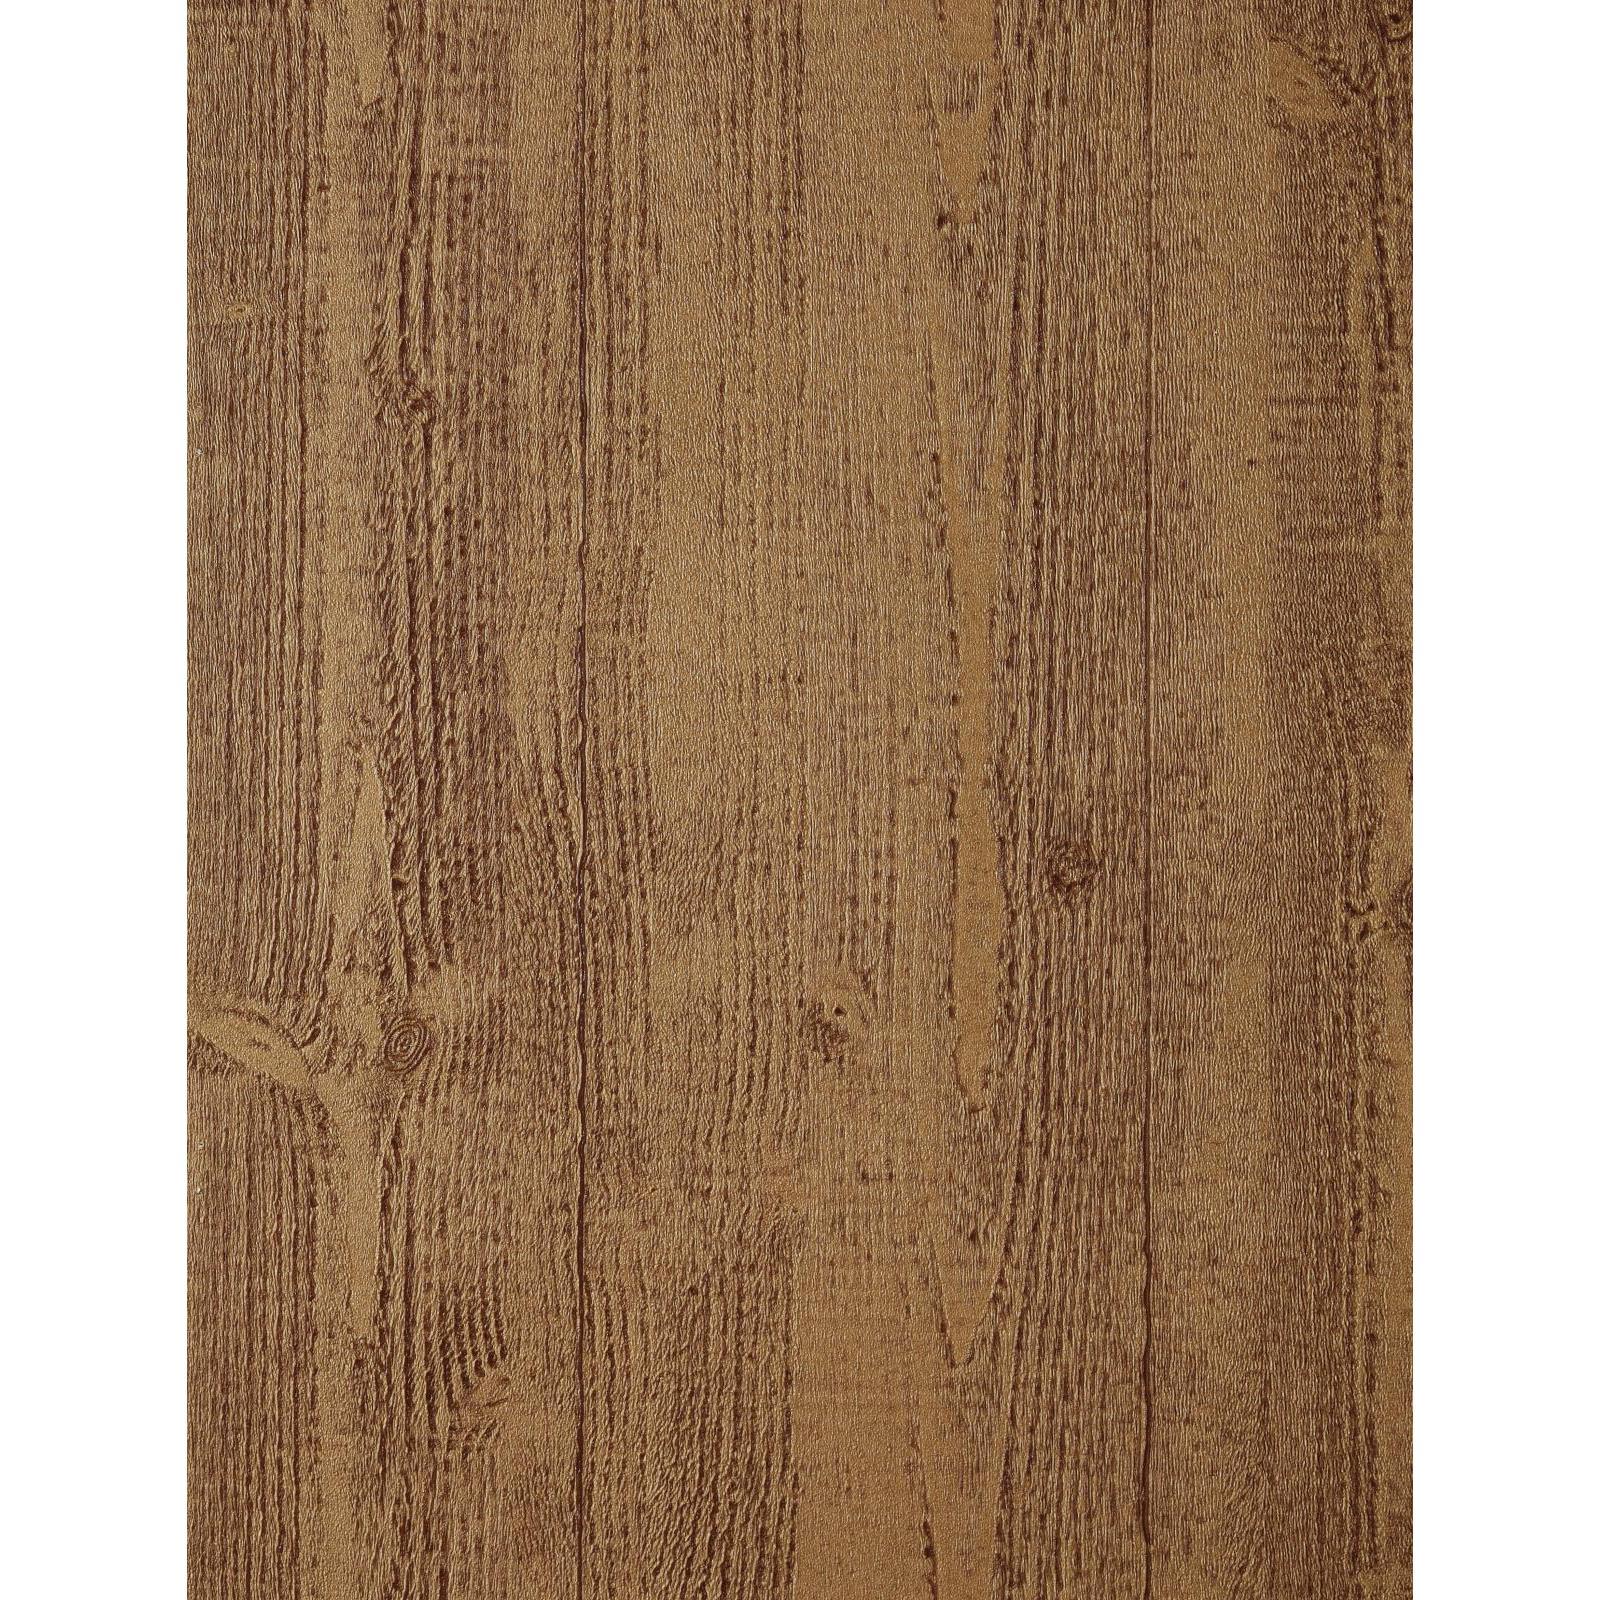 Rustic Raised Wood Wallpaper   Tools   Painting Supplies   Wallpaper 1600x1600